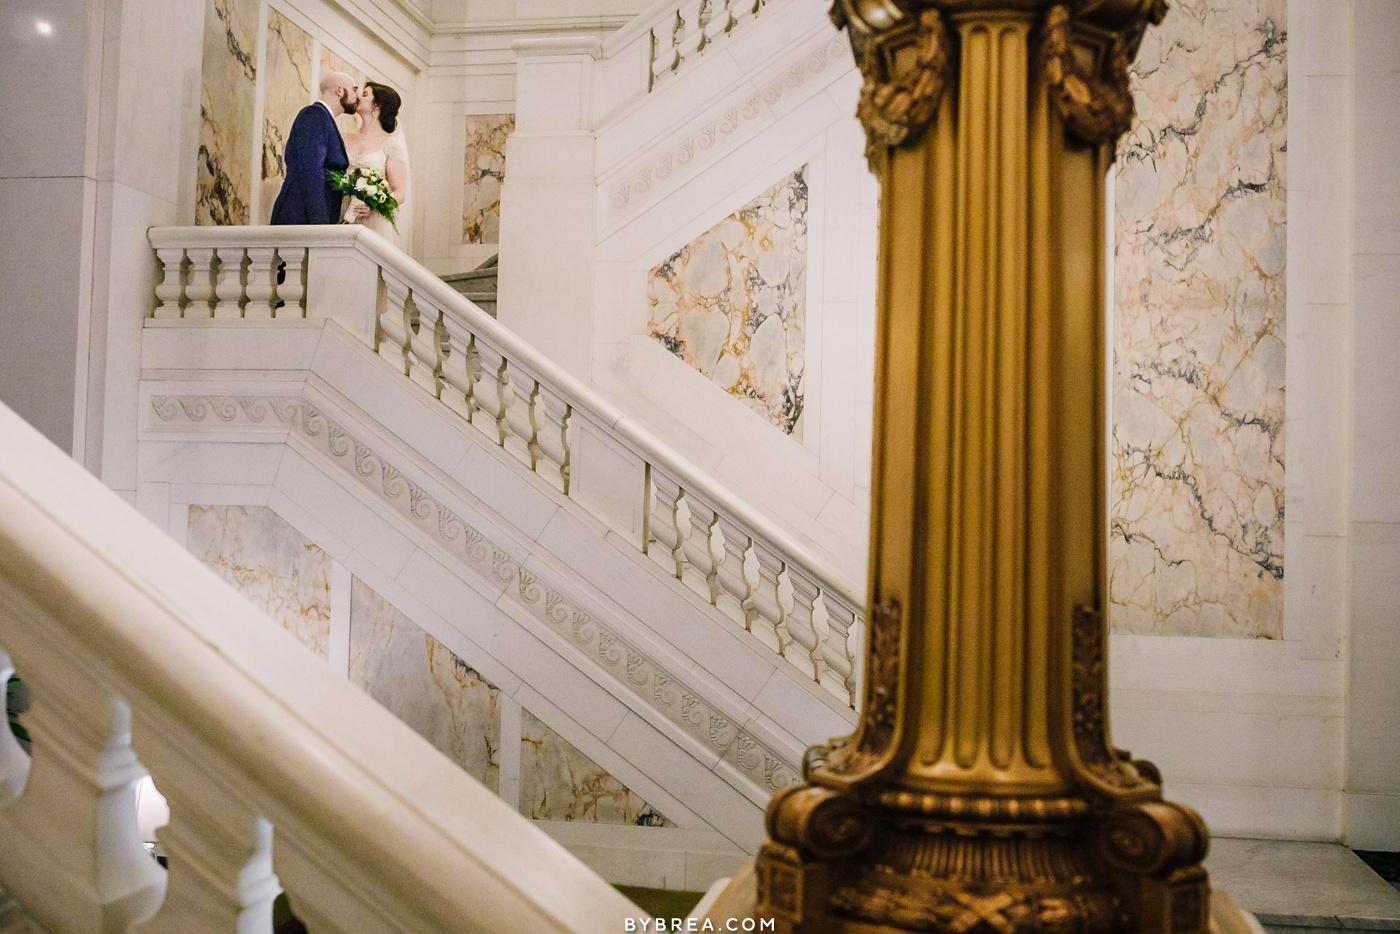 Couples portrait staircase photo Hotel Monaco wedding